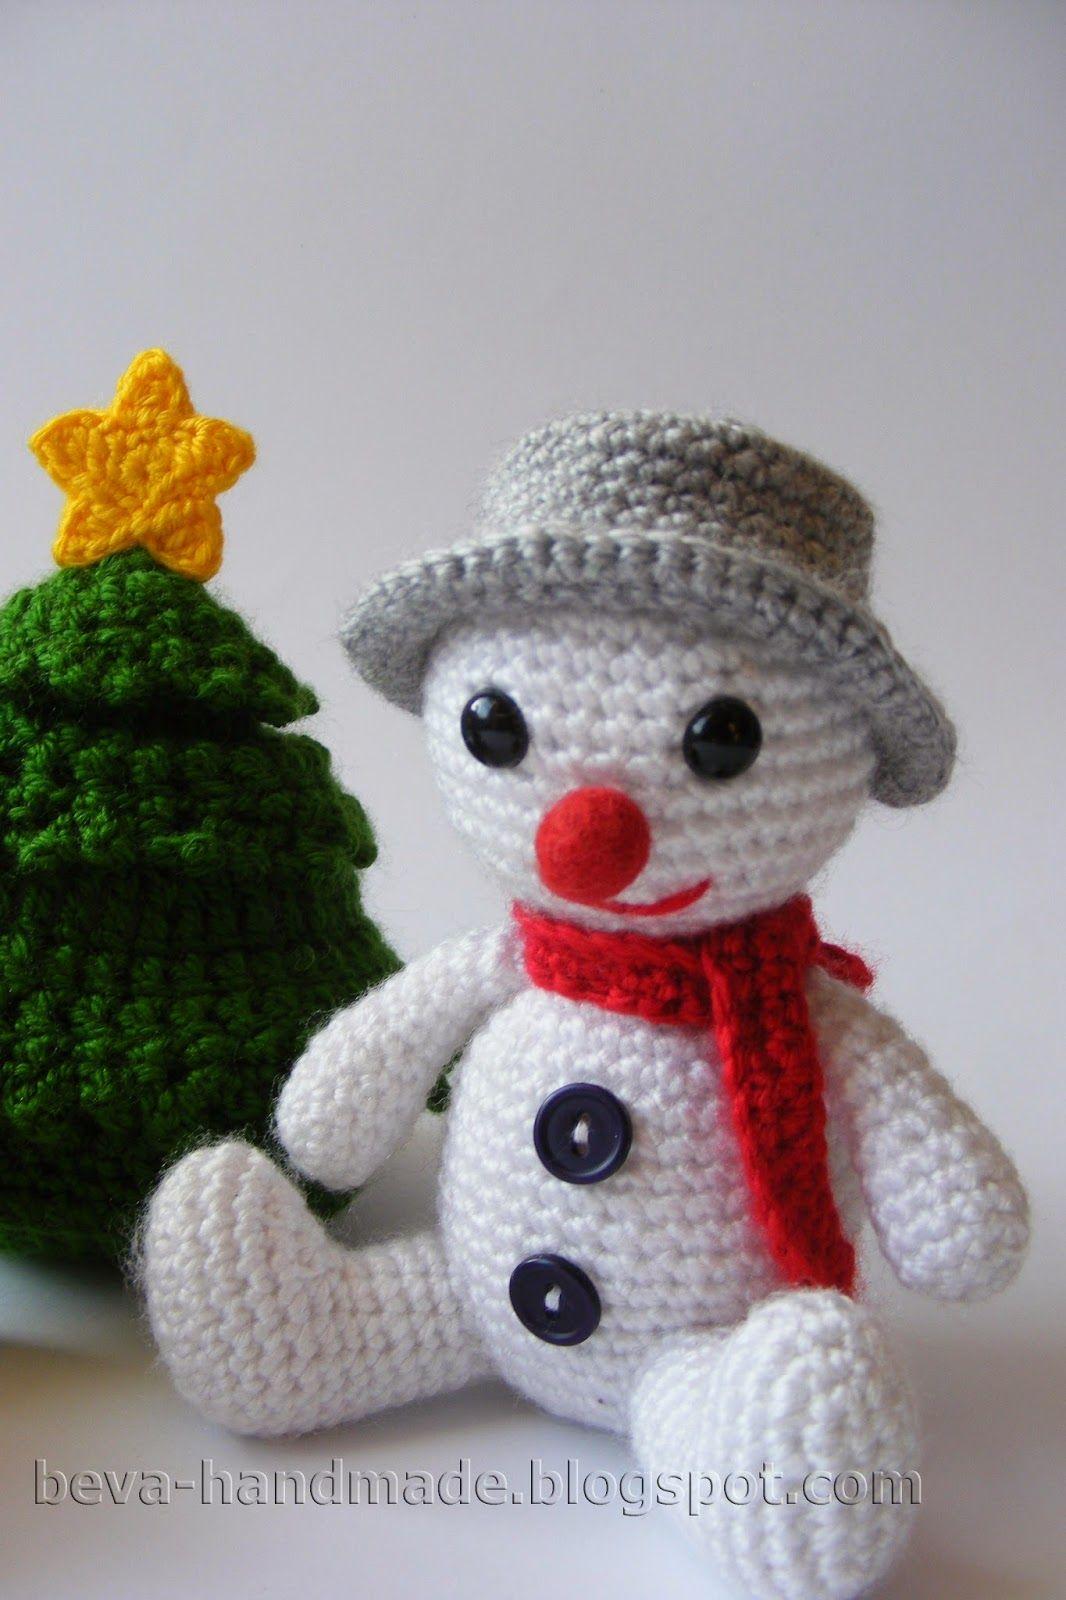 beva handmade: Bałwanek Bouli - opis/ Bouli the Snowman - free ...